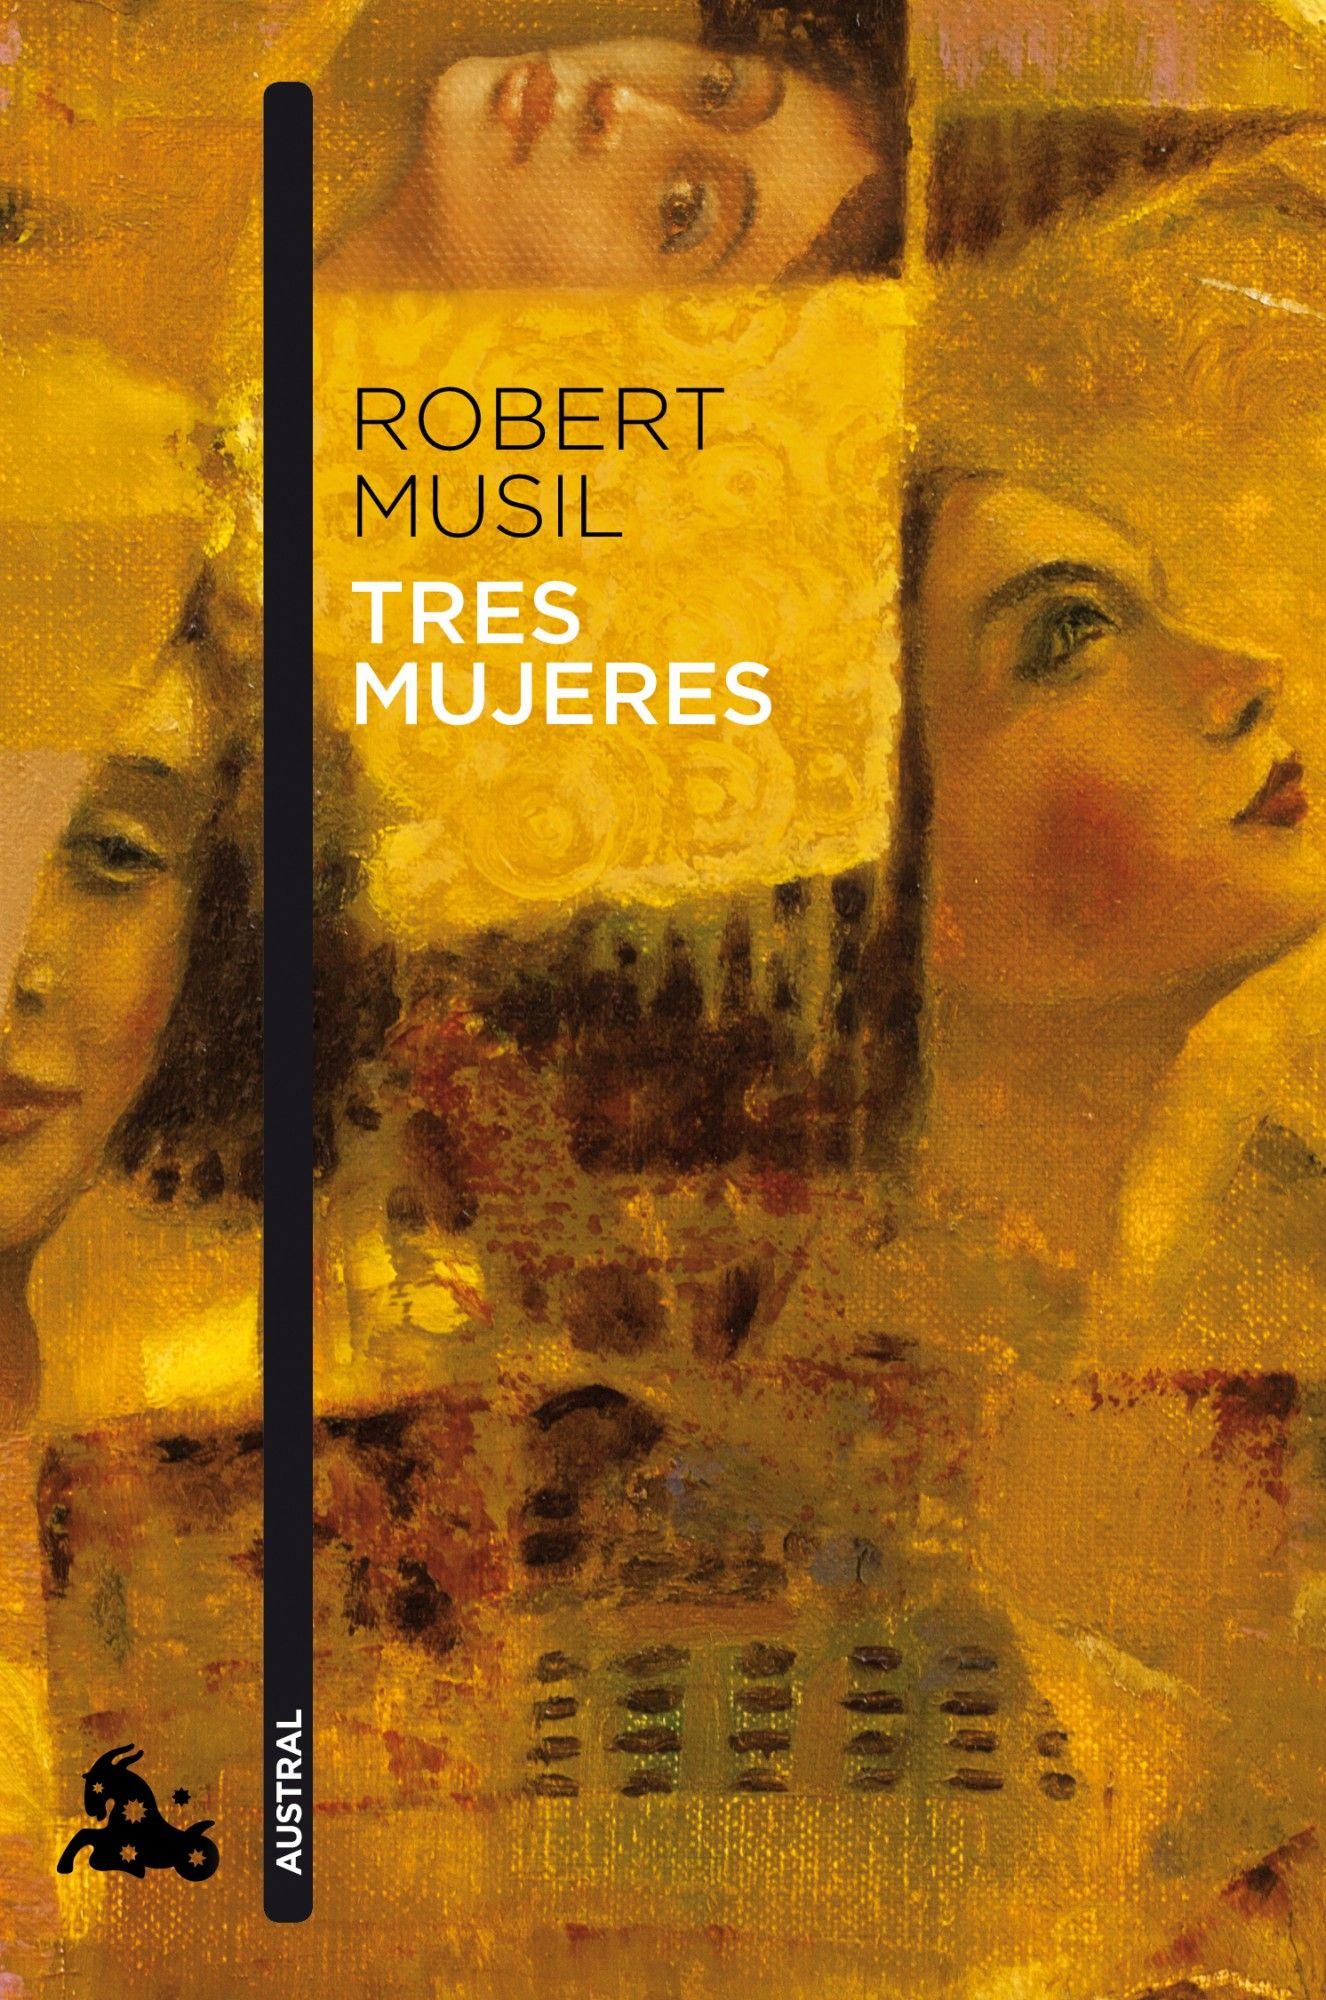 'Tres mujeres' de Robert Musil. #Ebook #NubicoPremium bit.ly/1tvXJe